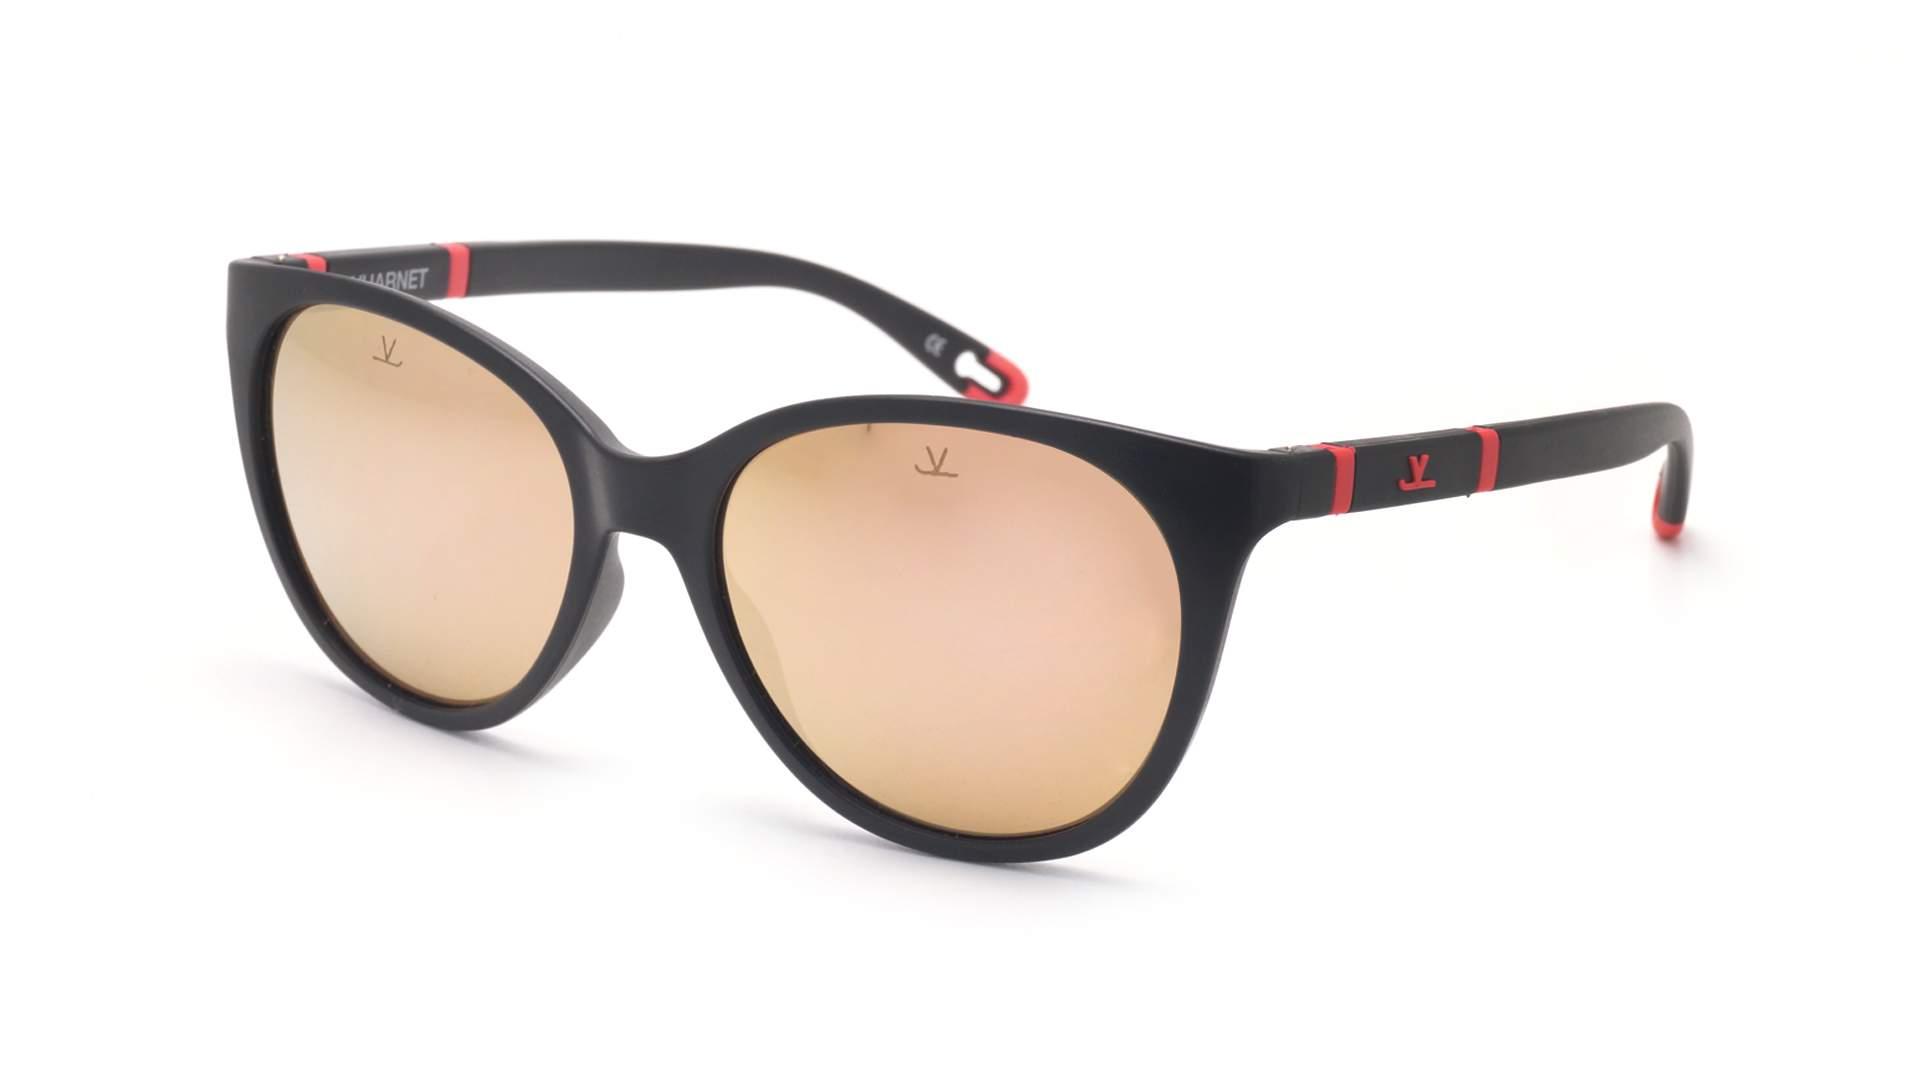 013678e6f63 Sunglasses vuarnet cat eye kids black matte junior mirror jpg 1920x1080  Vuarnet cat eyes